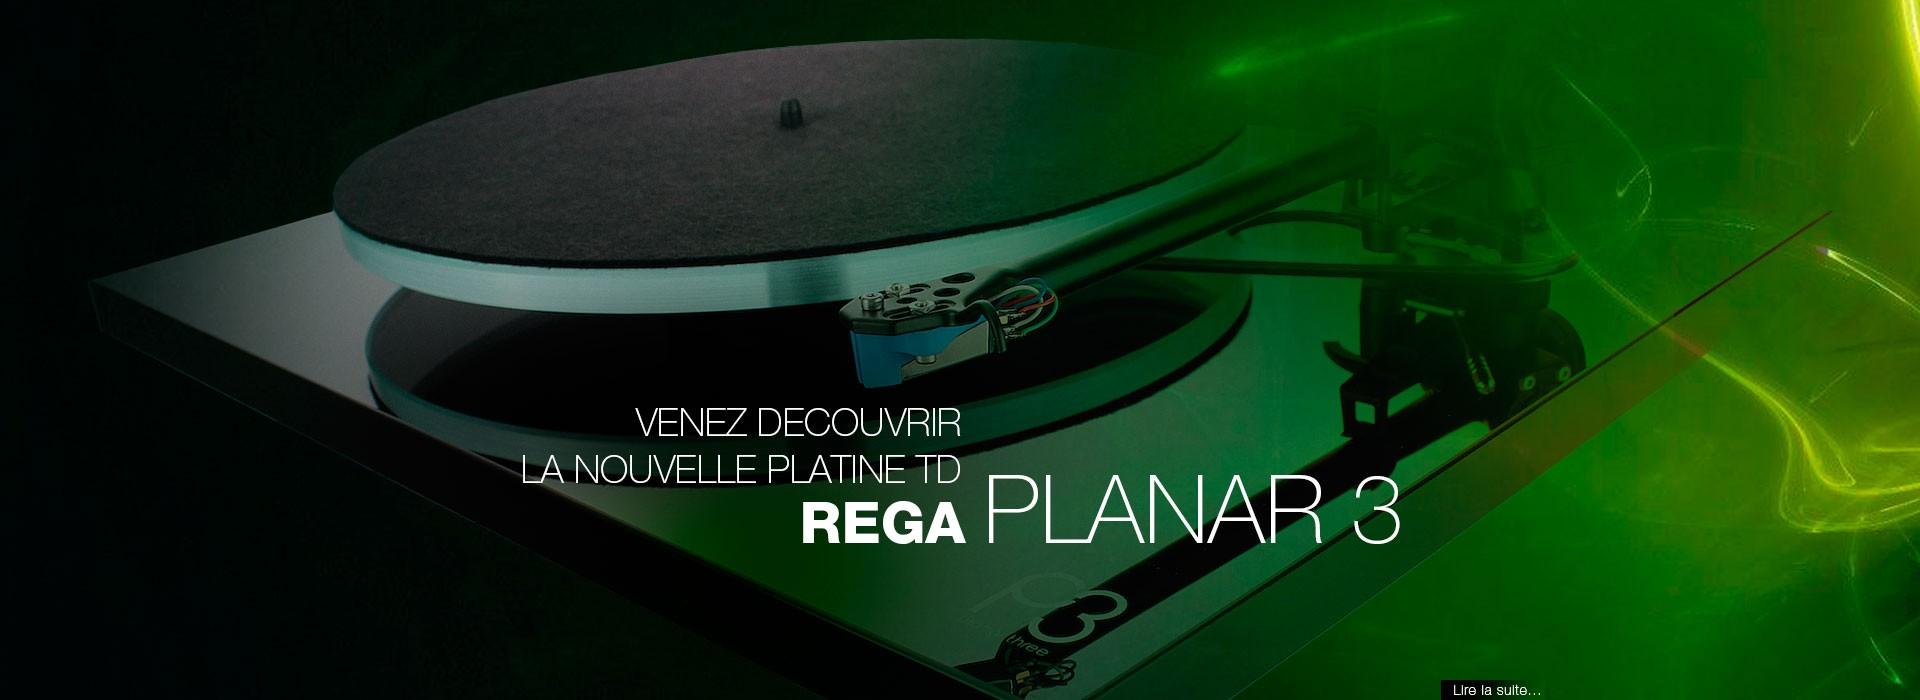 Rega P3